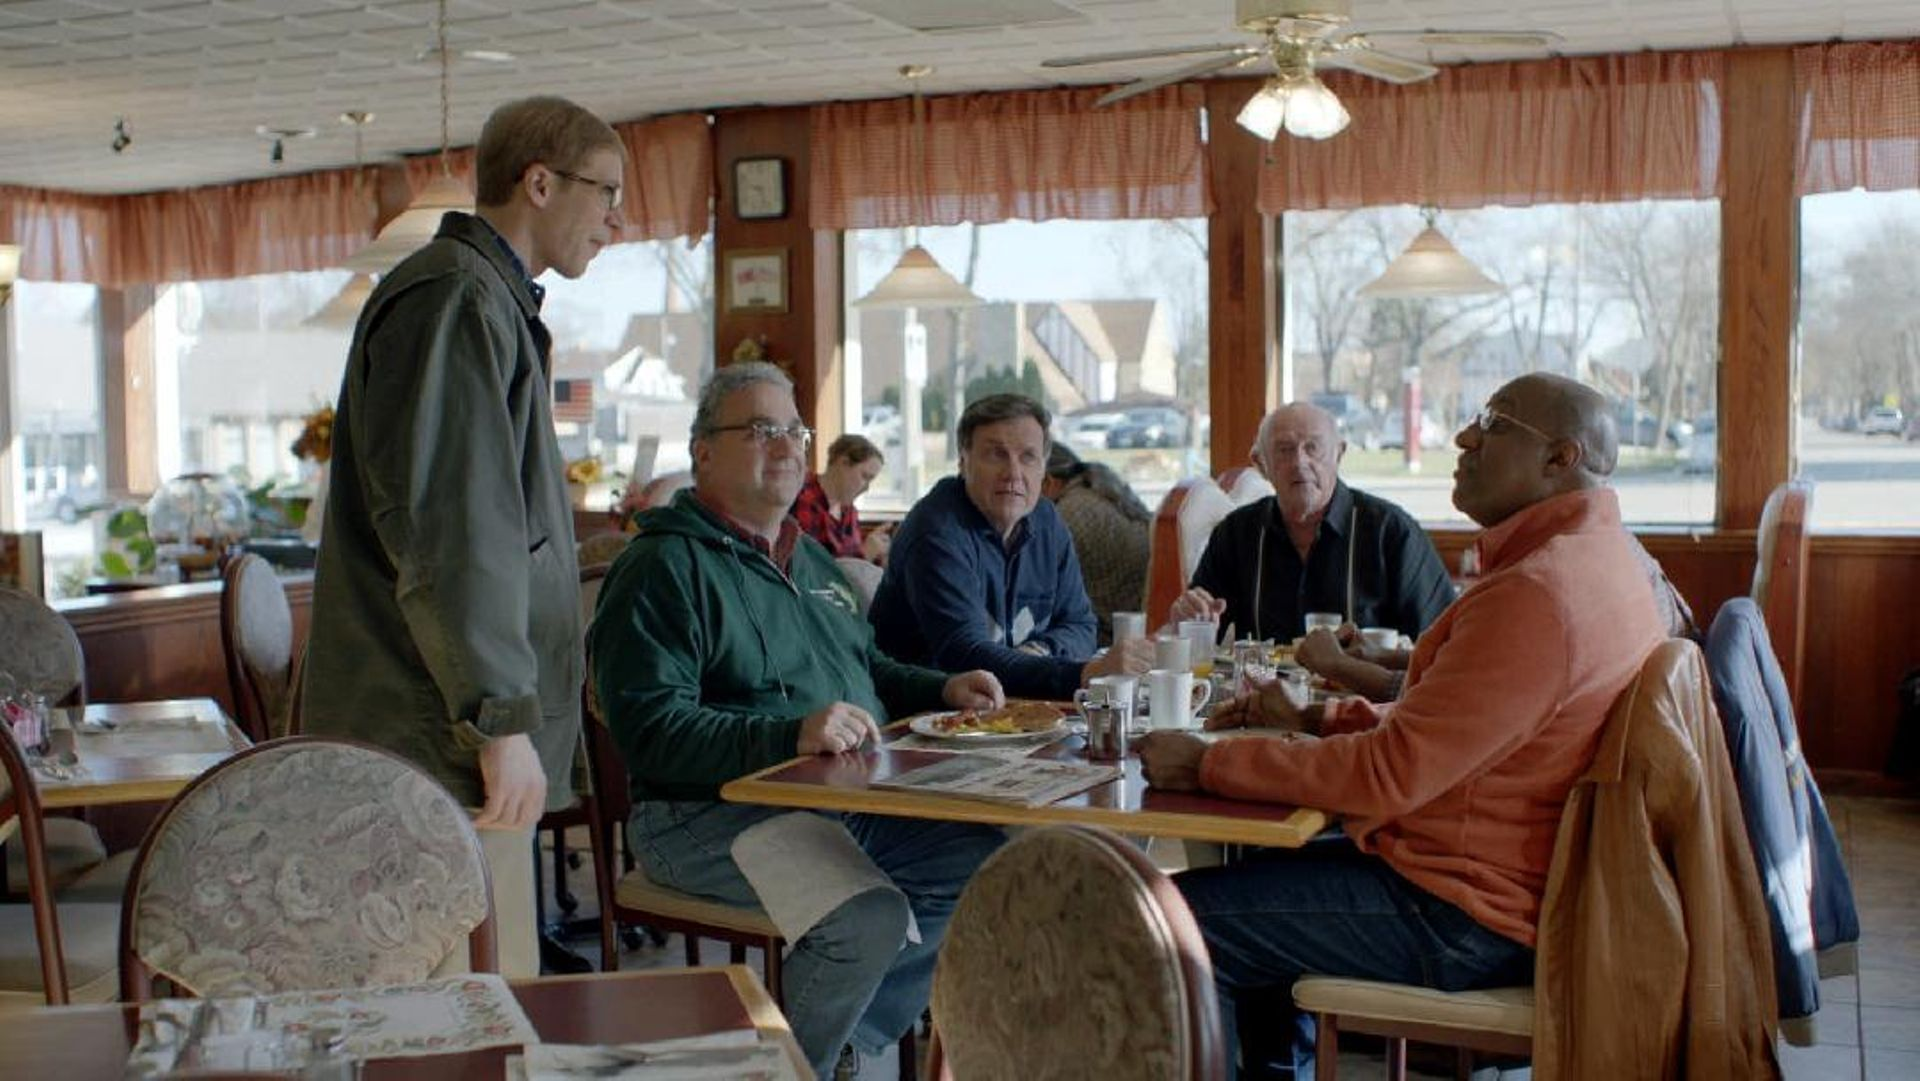 Joe Pera Takes You to Breakfast - Joe Pera Talks With You - Adult ...